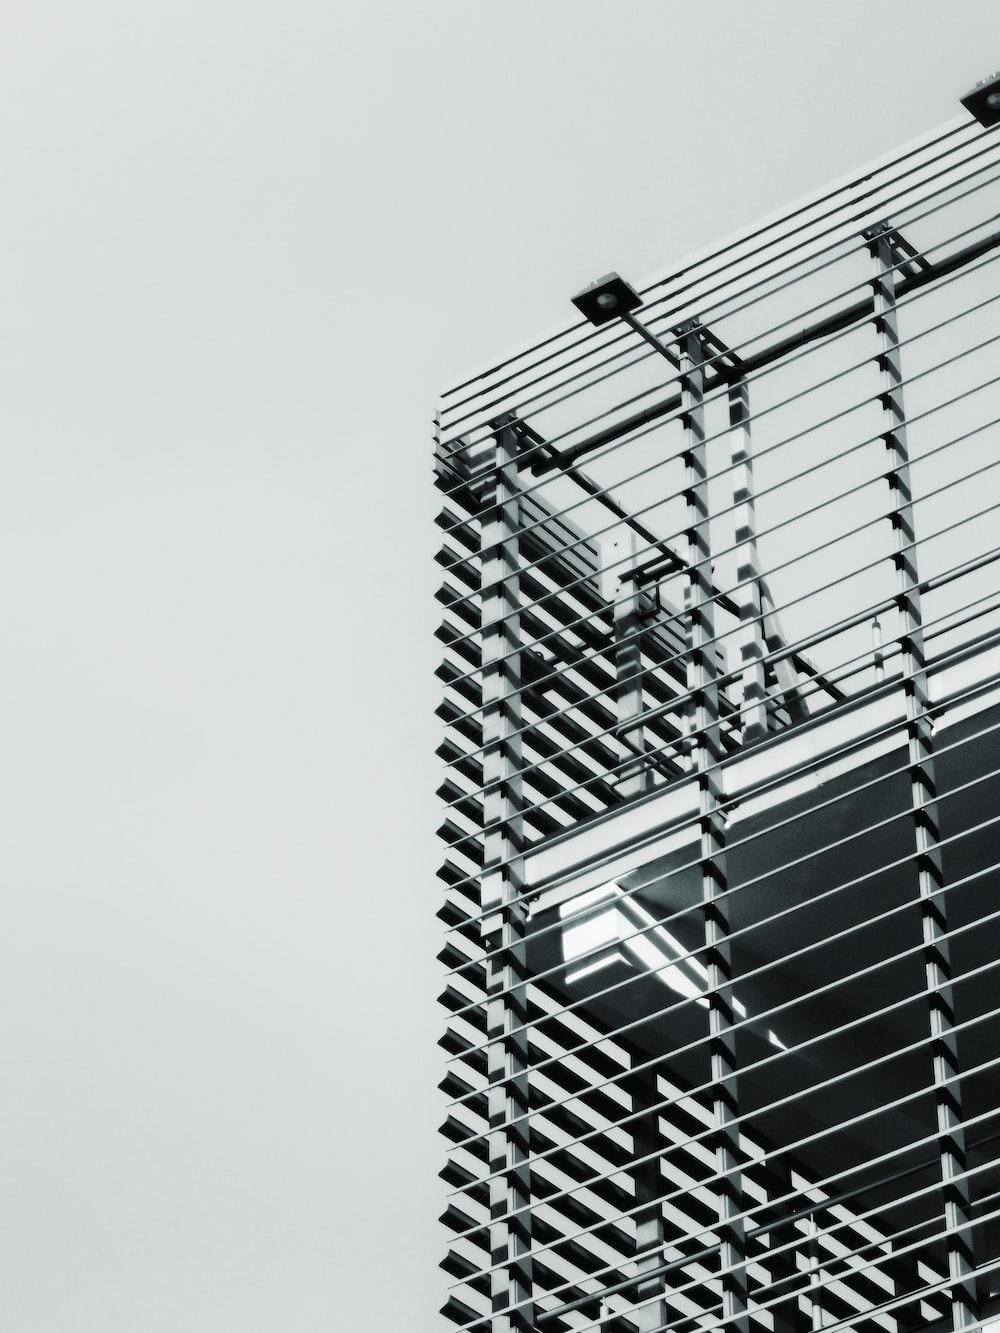 white and black steel frame